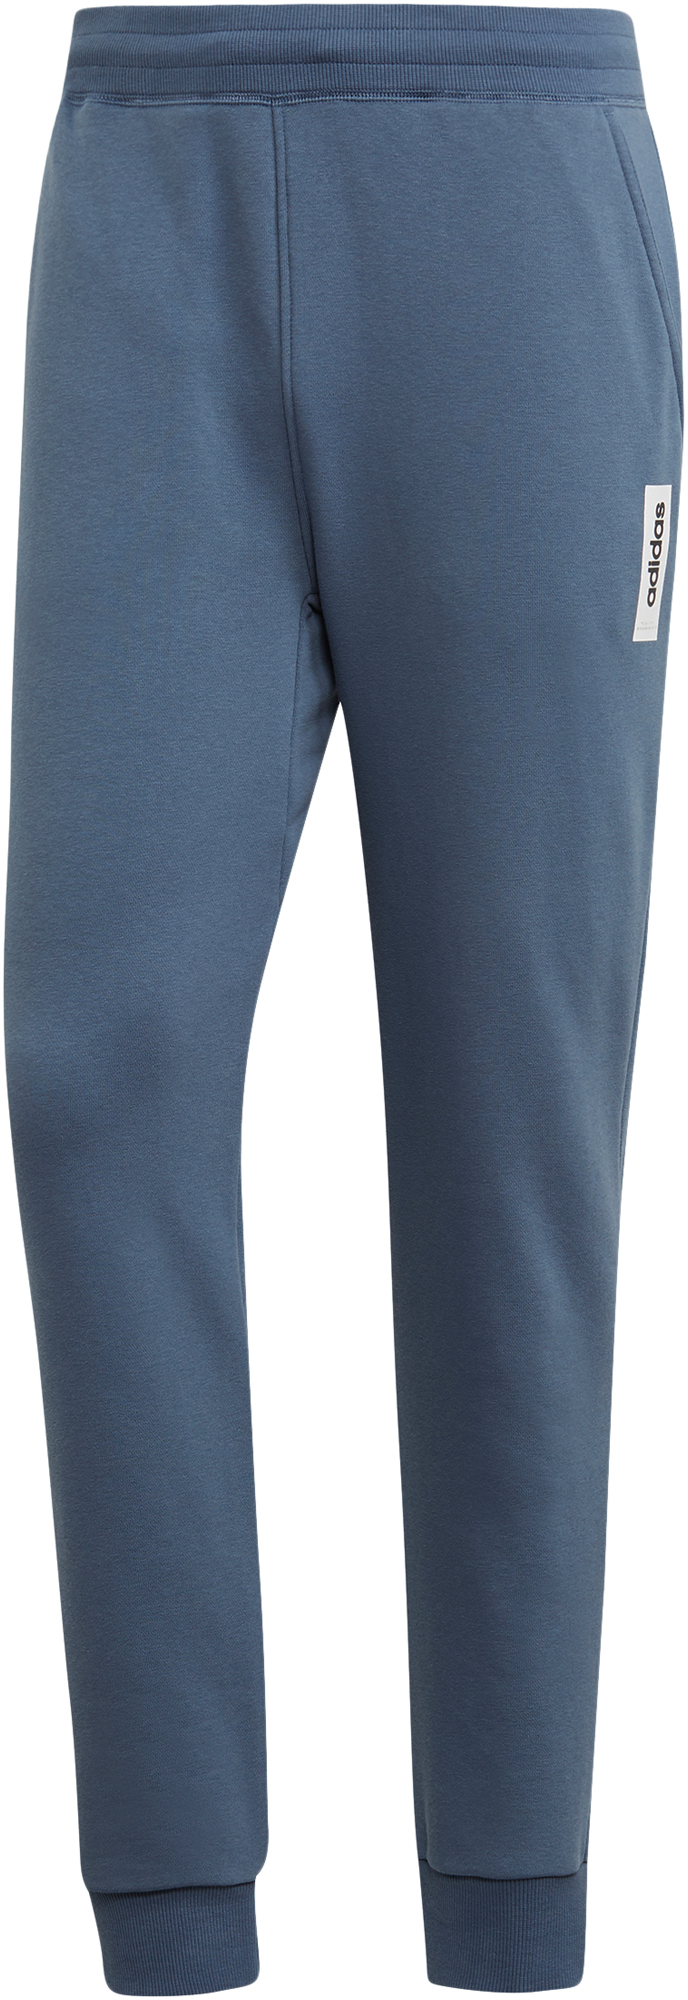 Adidas Брюки мужские Brilliant Basics, размер 48